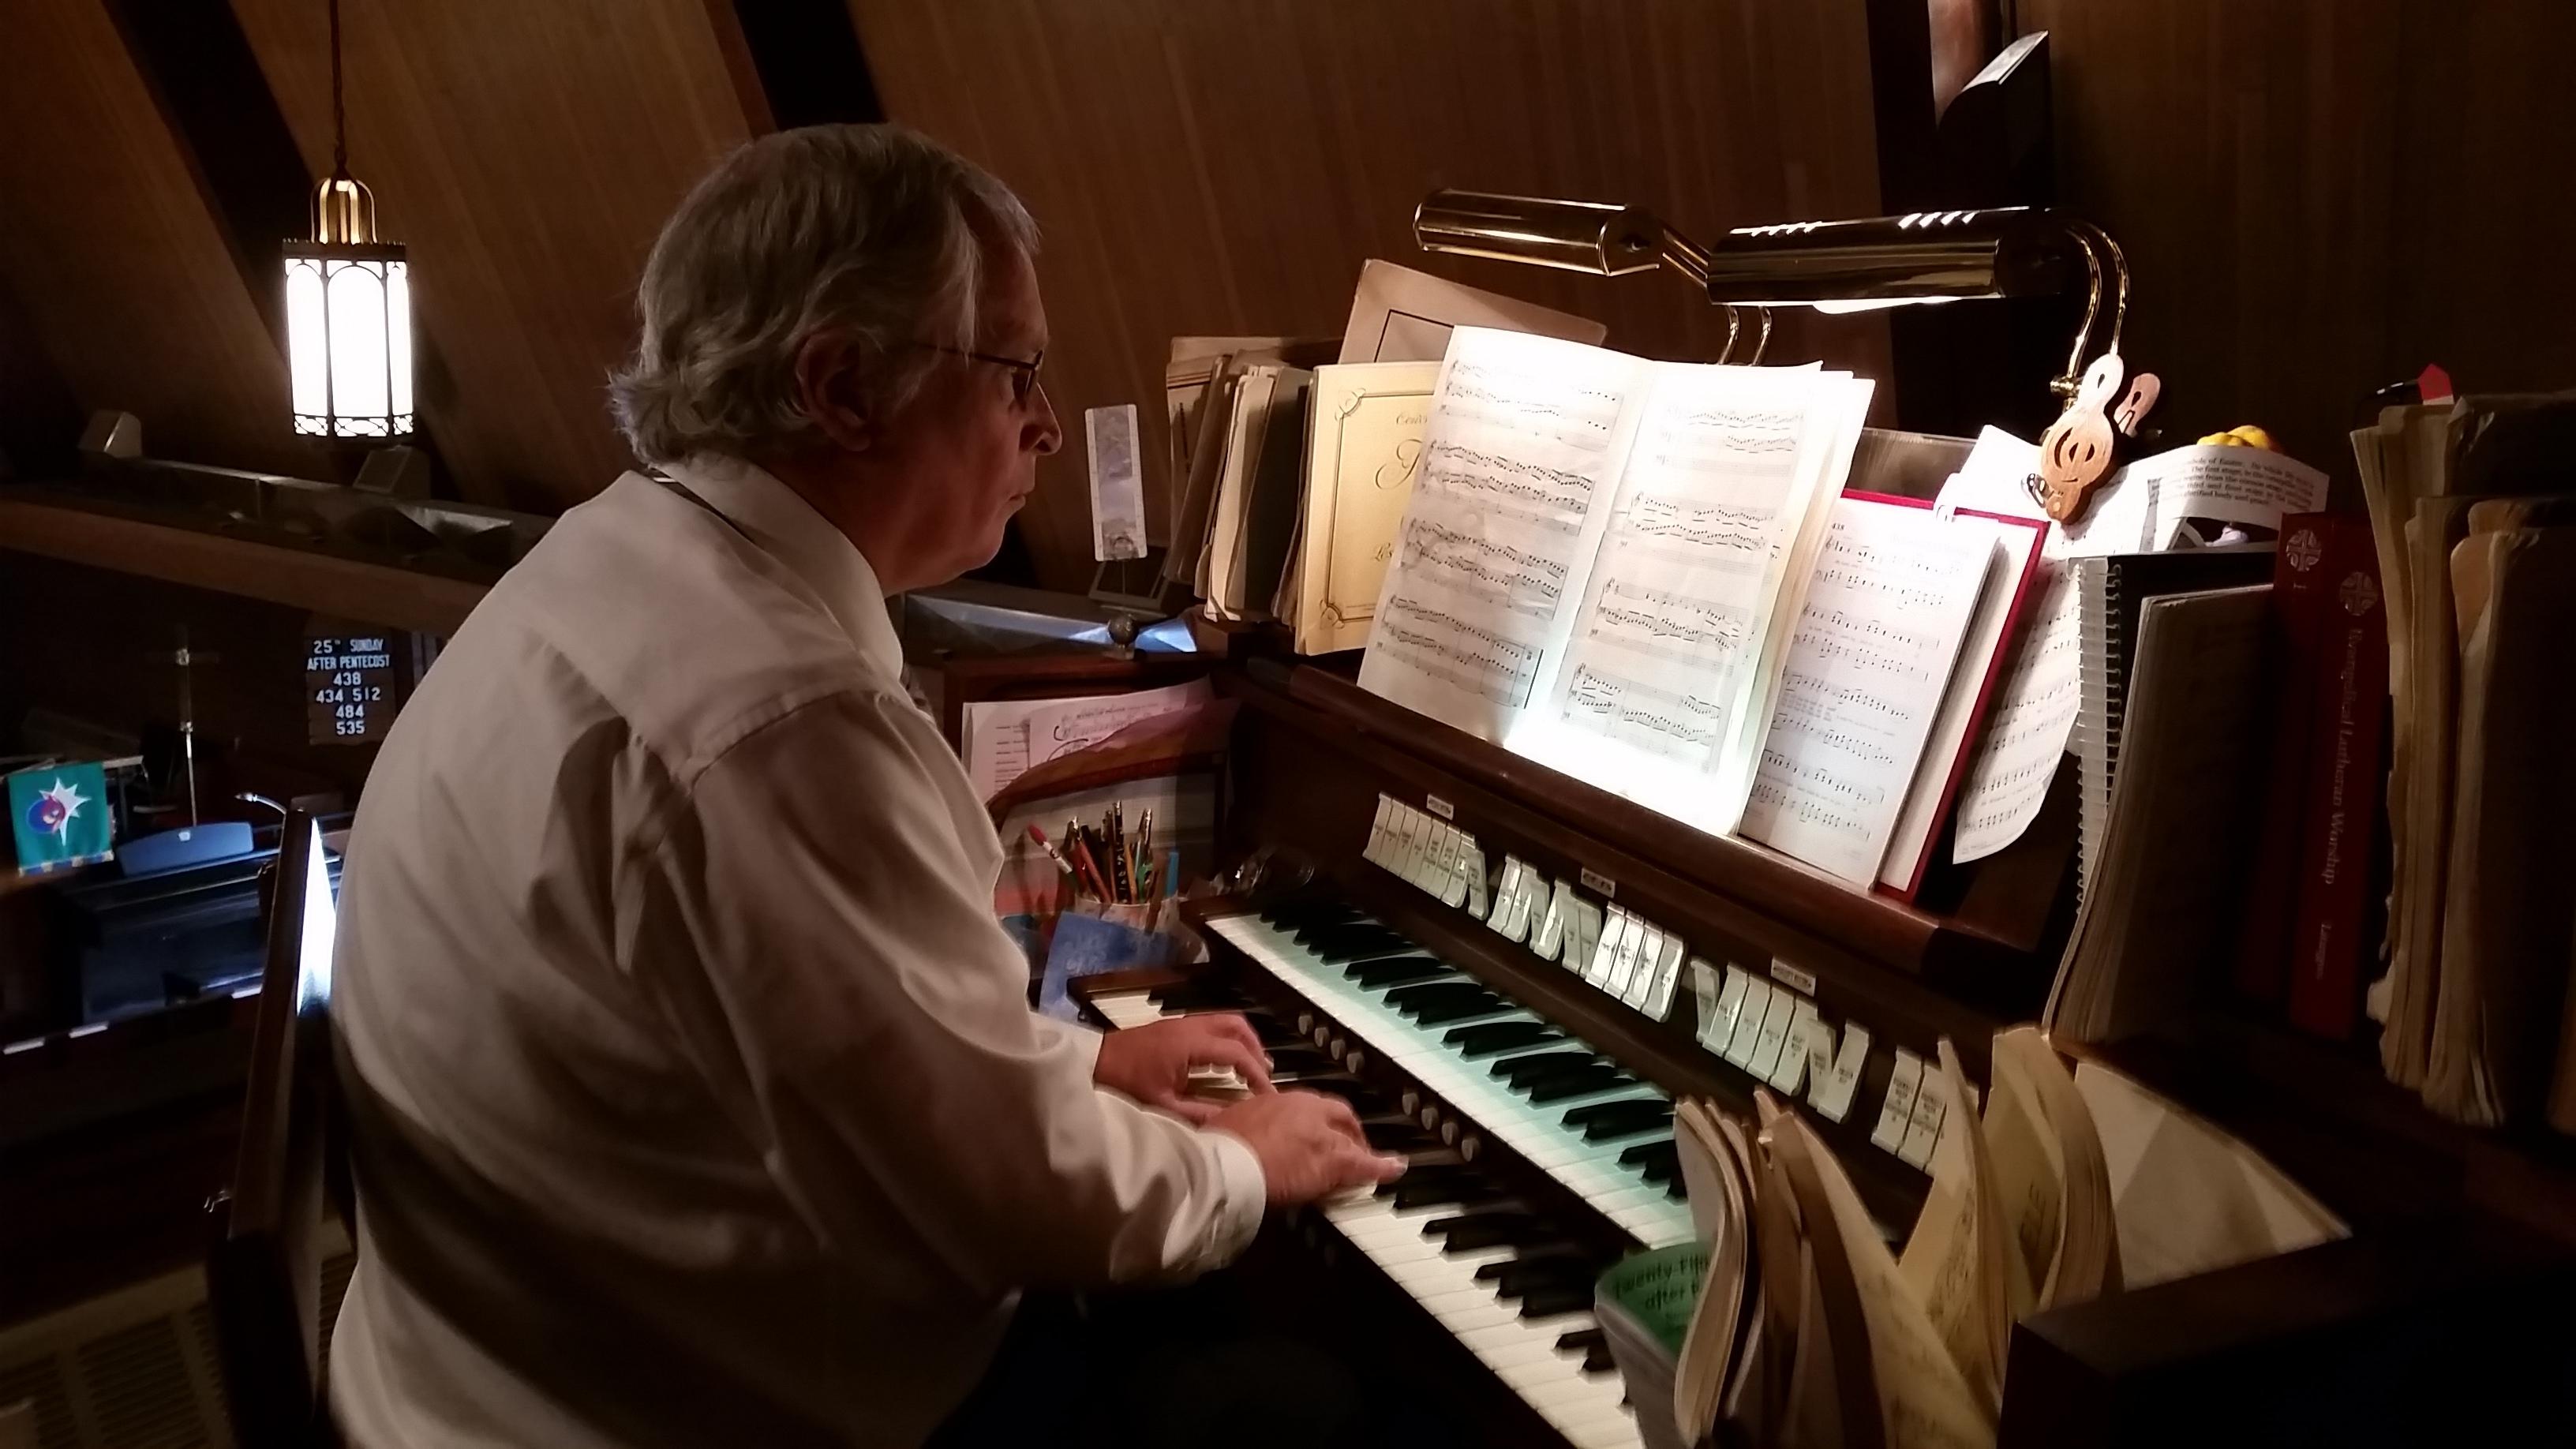 Arnie on the Organ